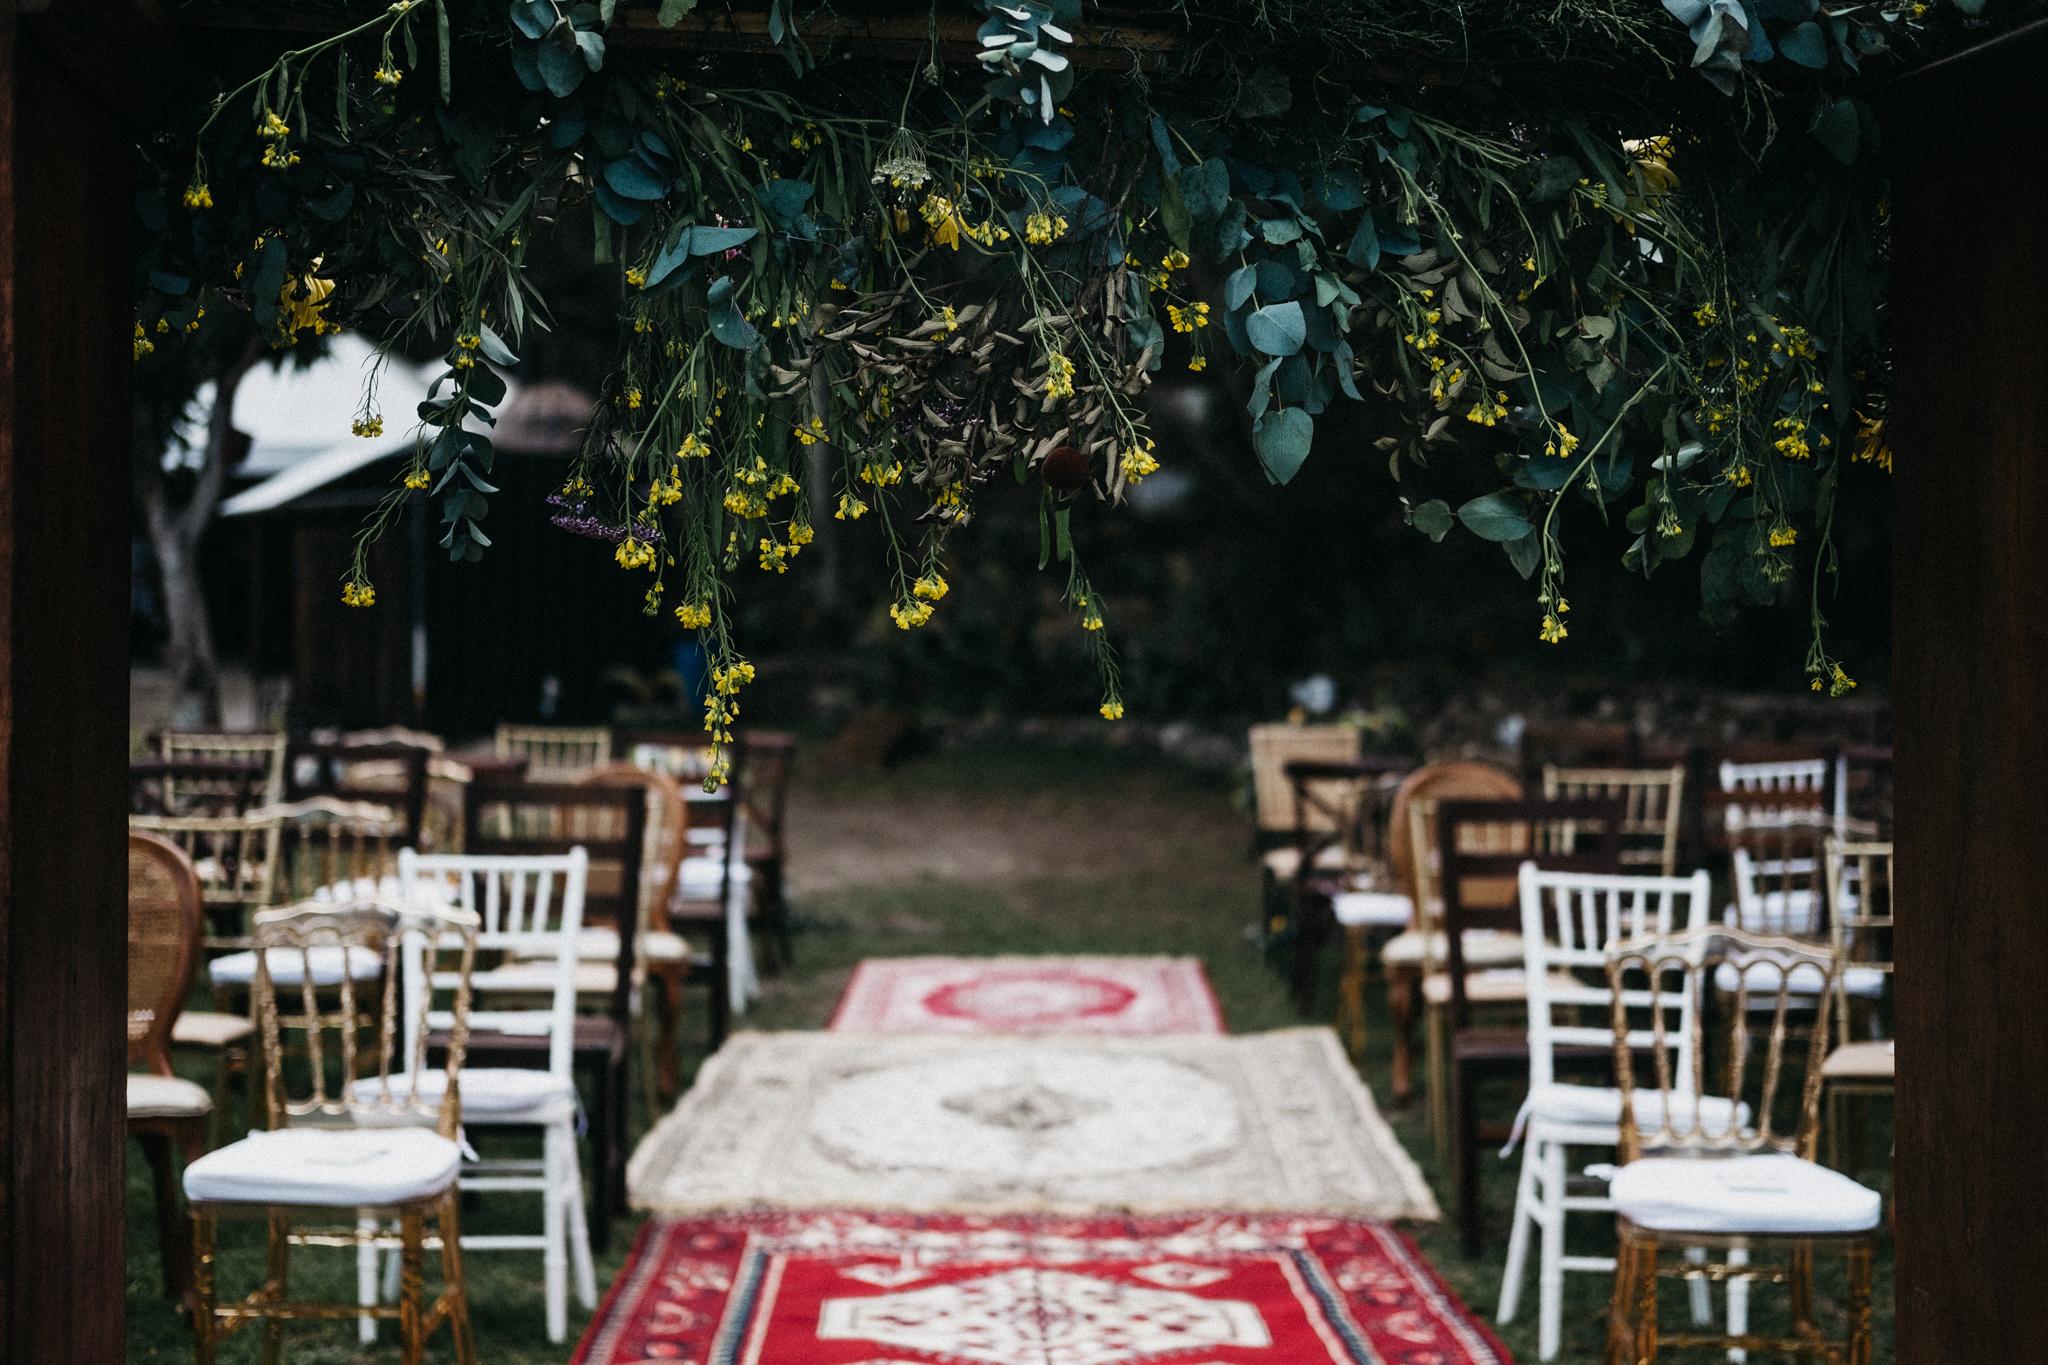 2018.08 Casamento Priscila Barros e Patrizio 0016.jpg